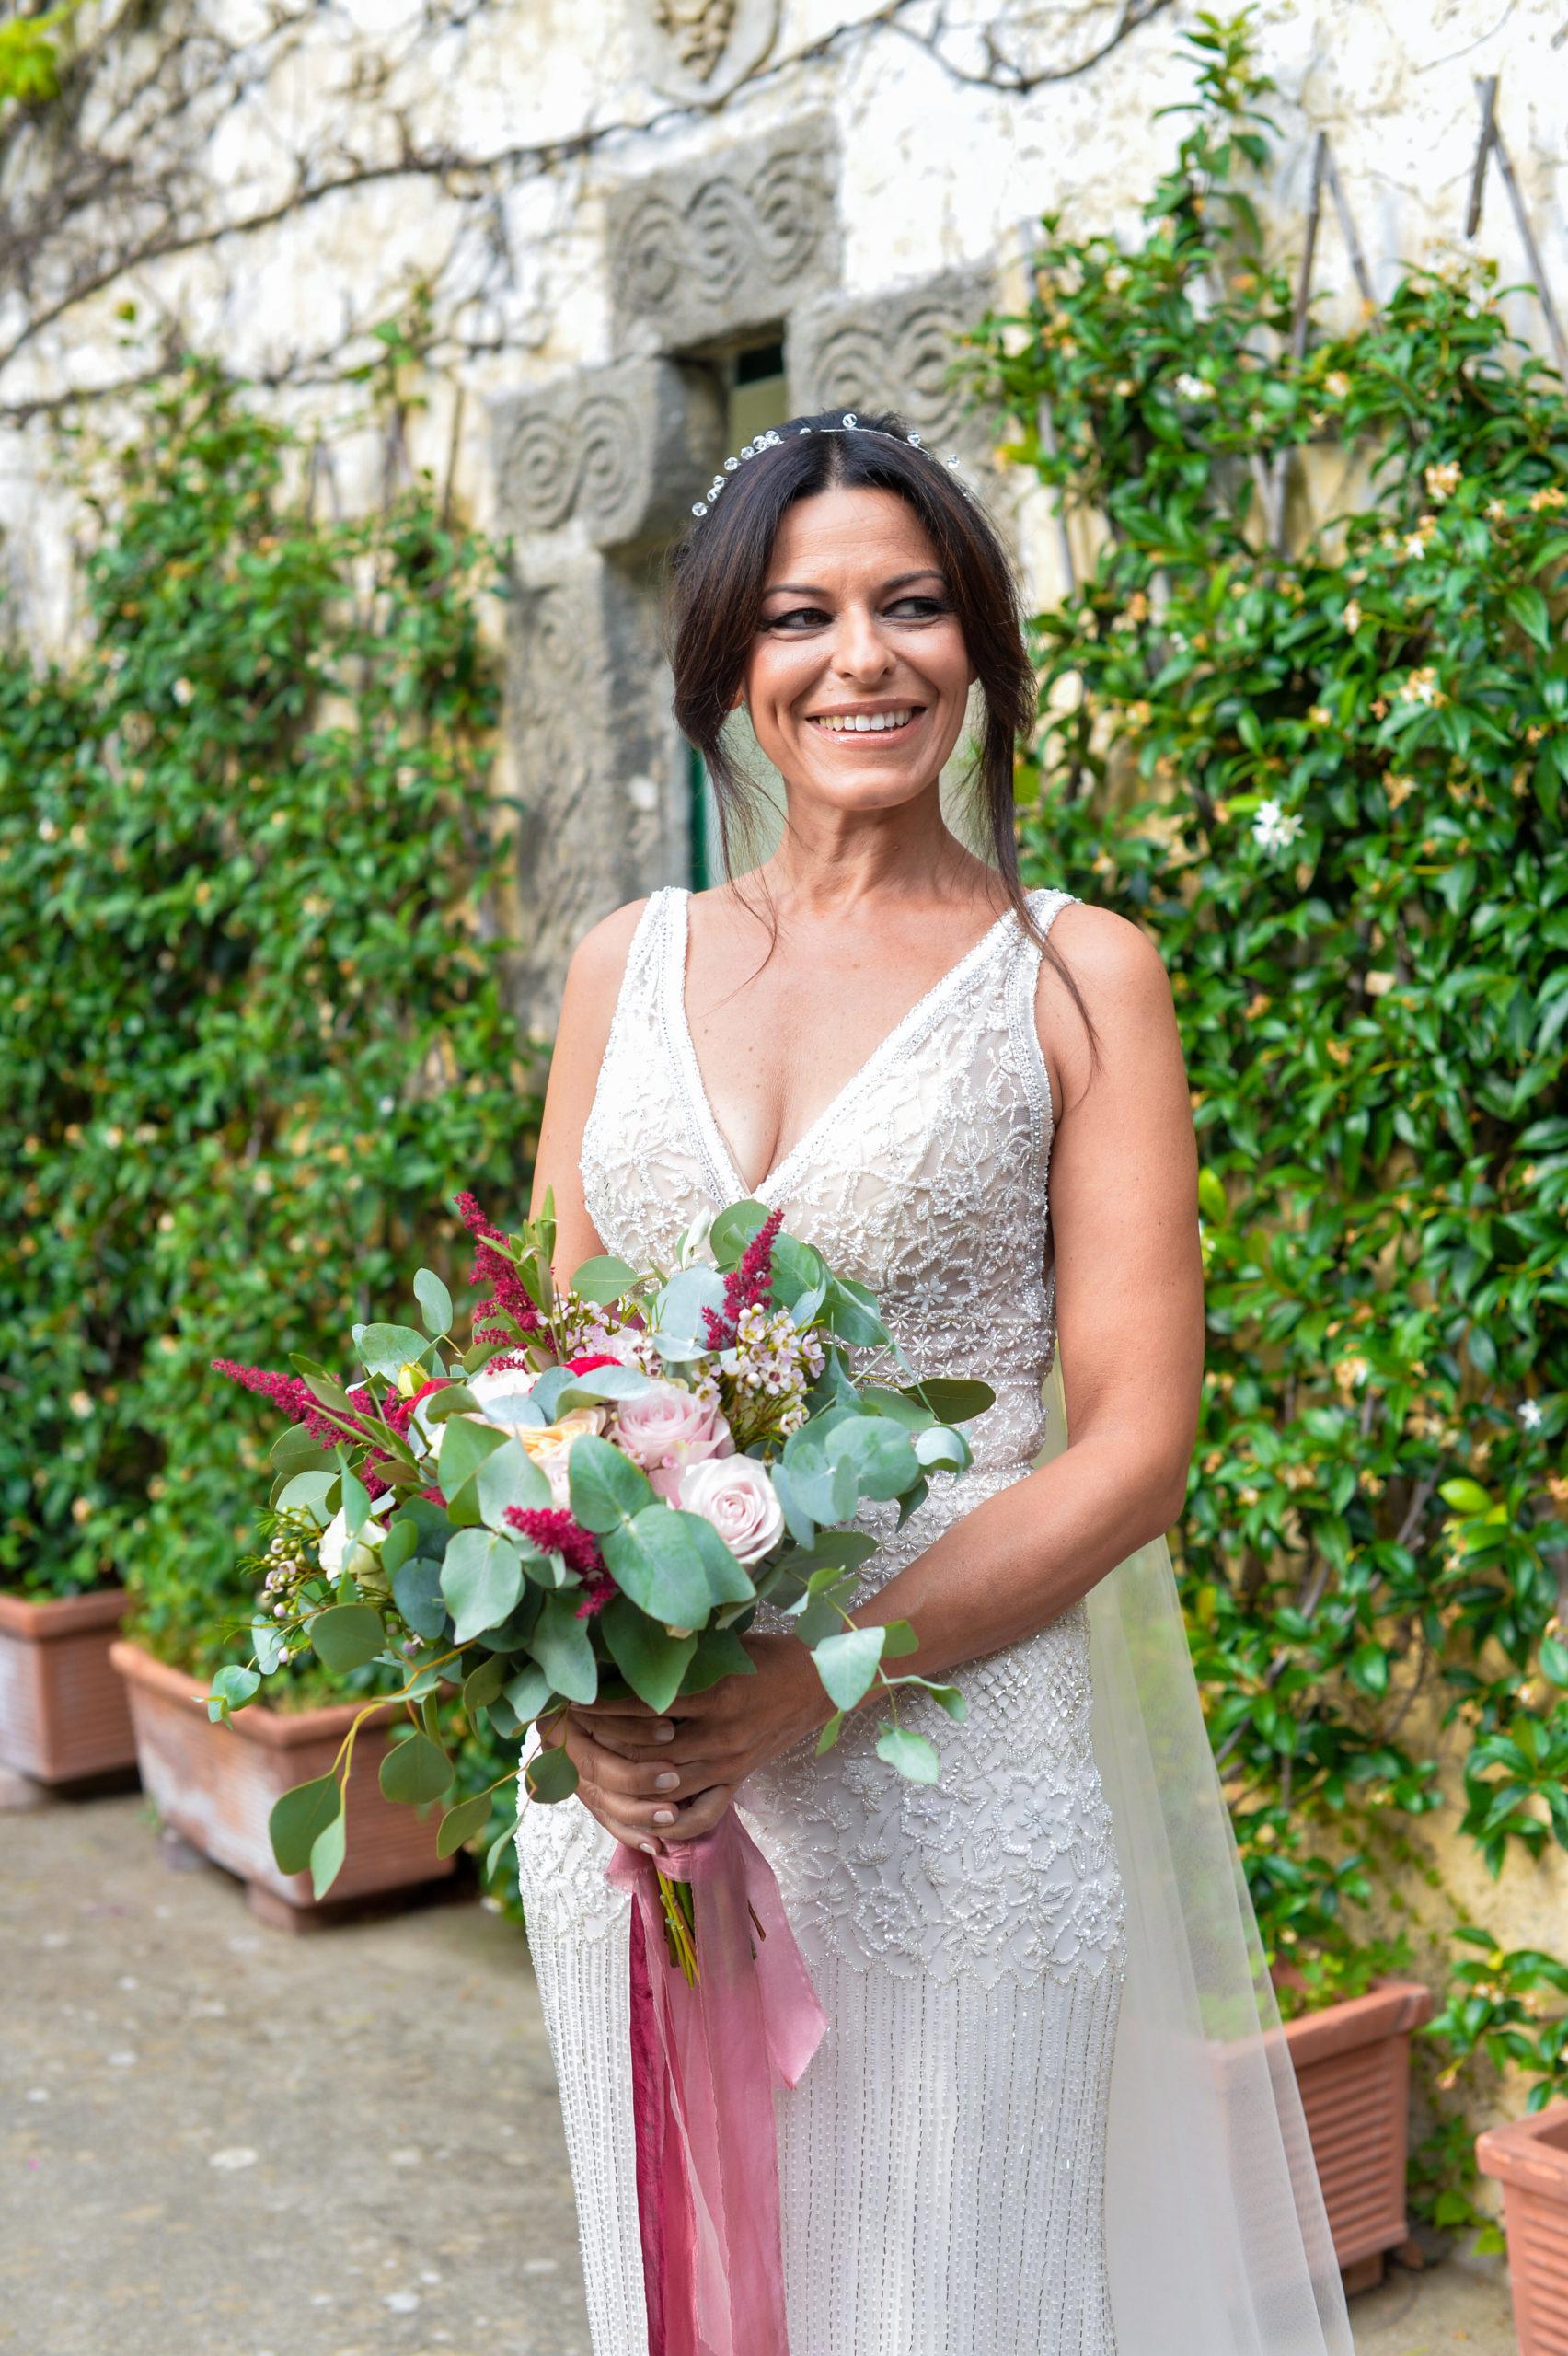 Daniela the bride - Ravello wedding (11)